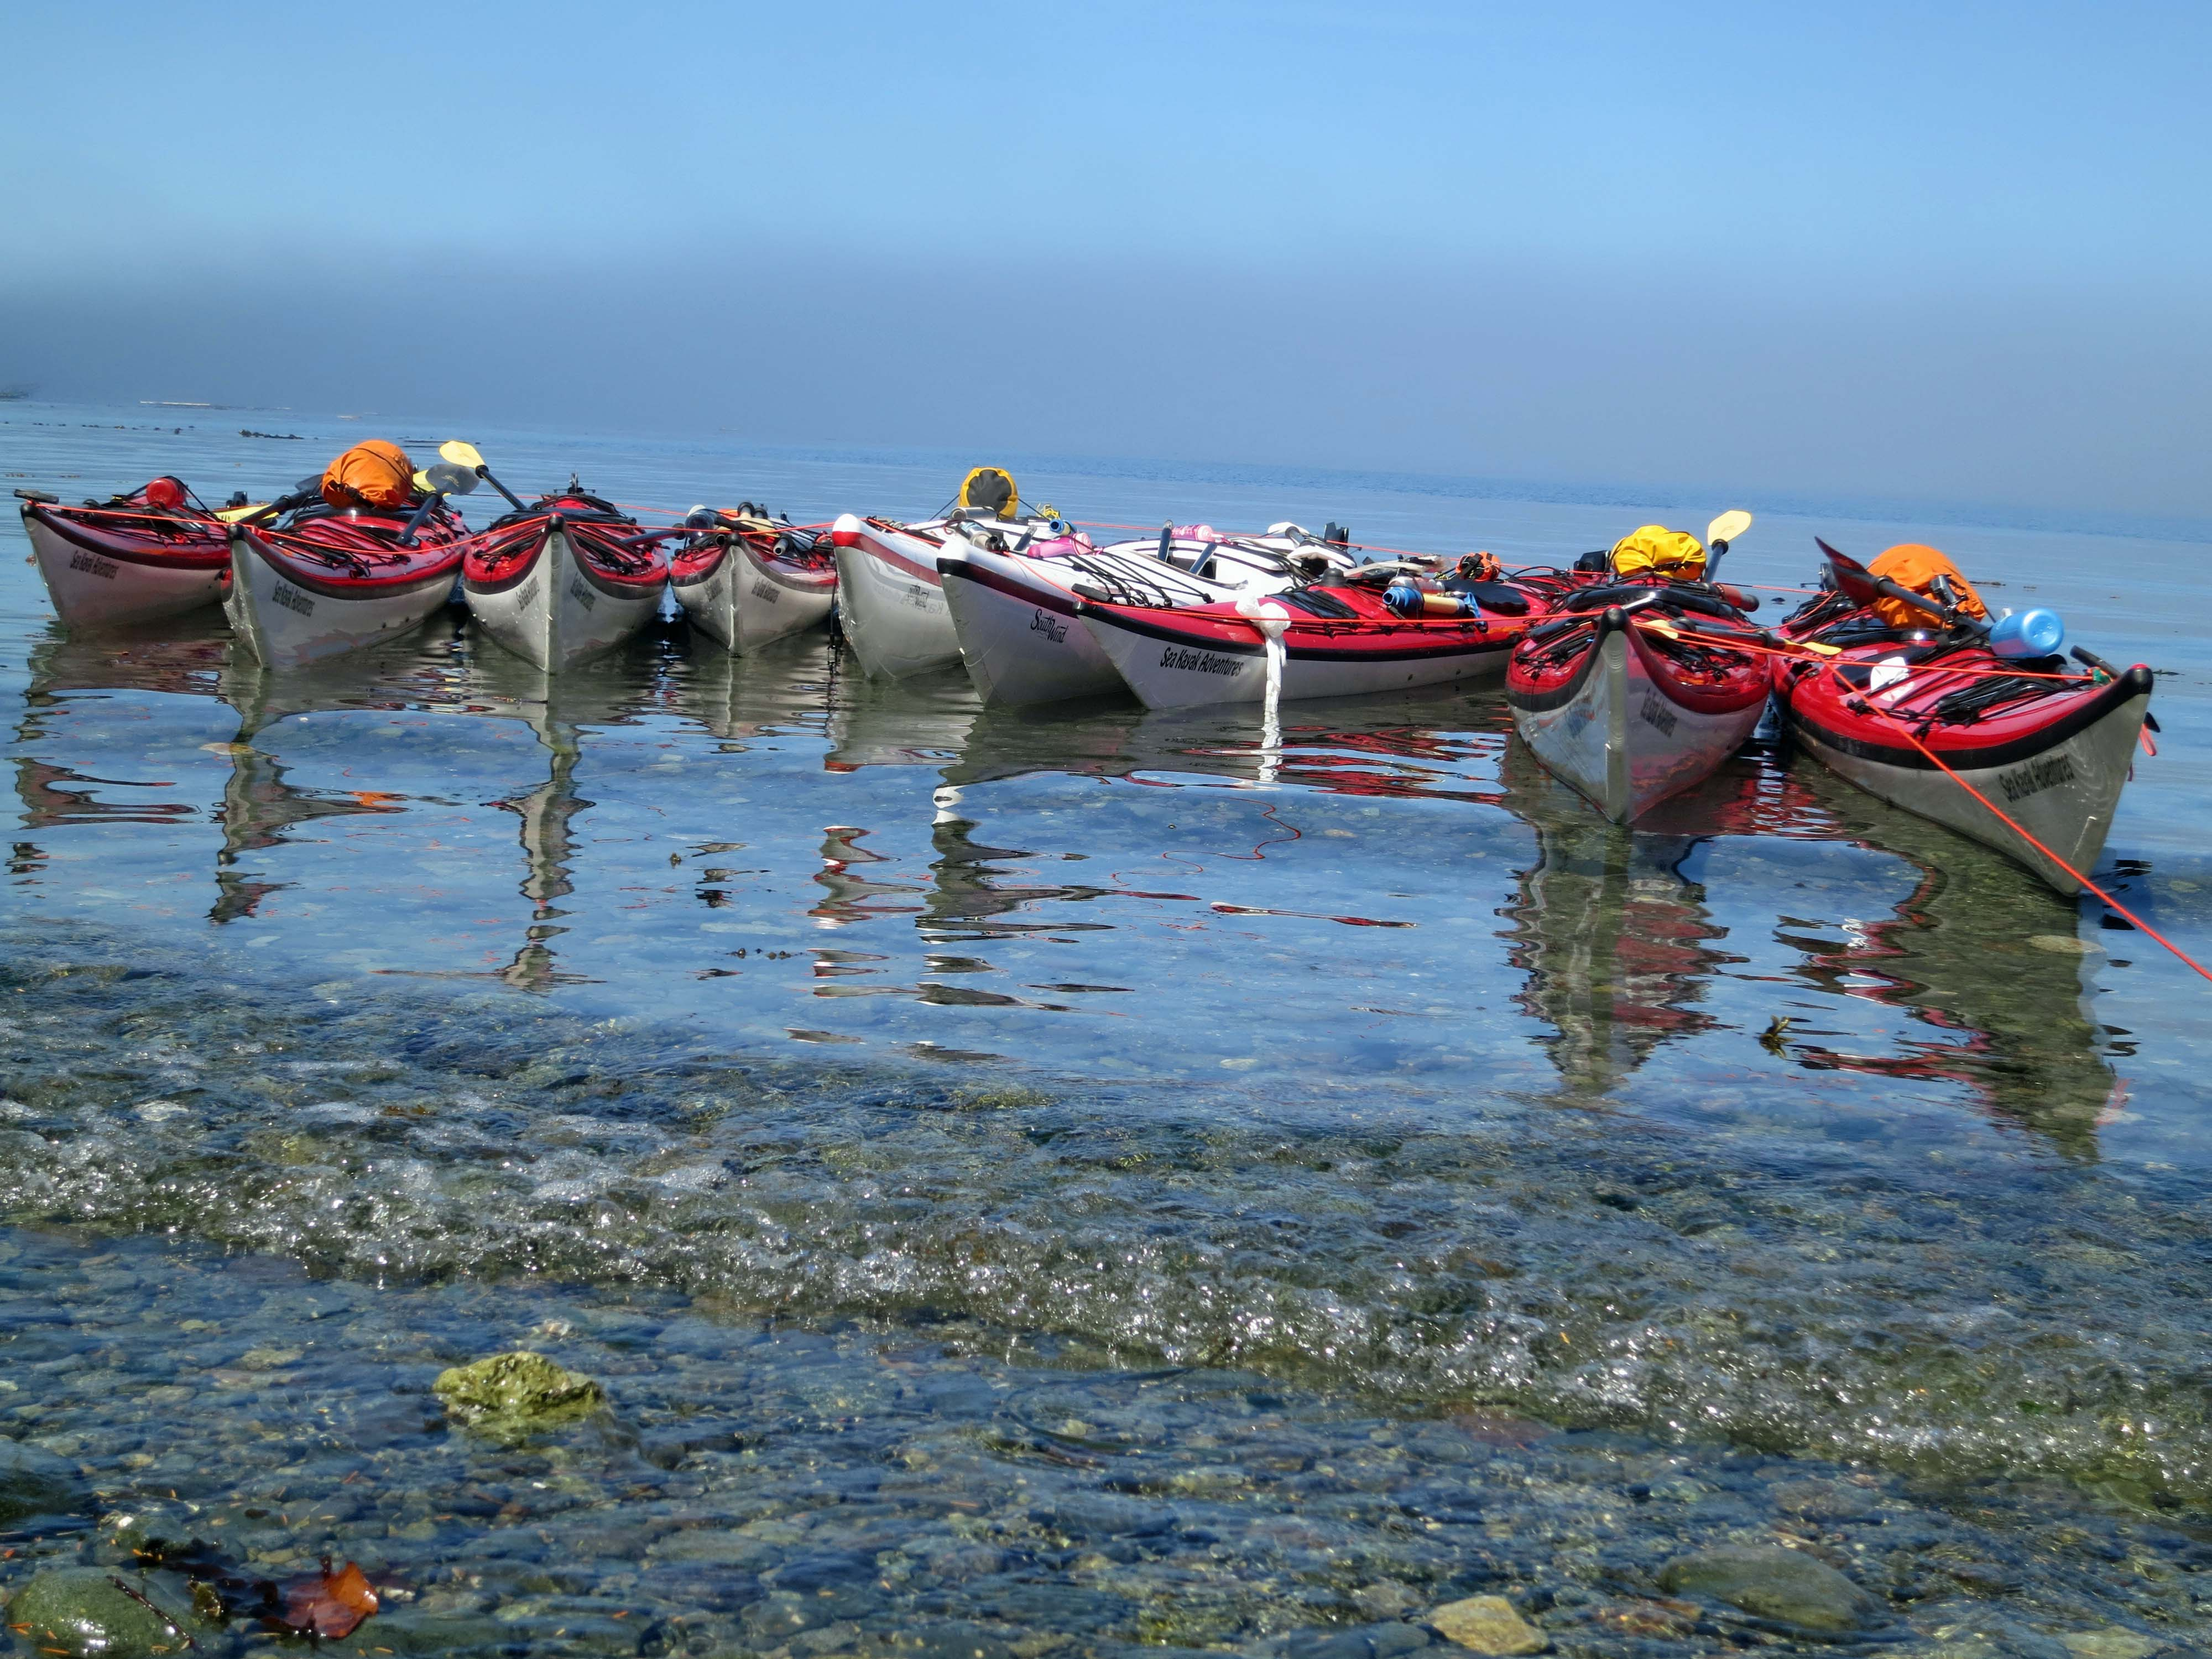 Kayaks belonging to the Sea Kayak Adventure group in the waters of Johnstone Strait, northeastern Vancouver Island.